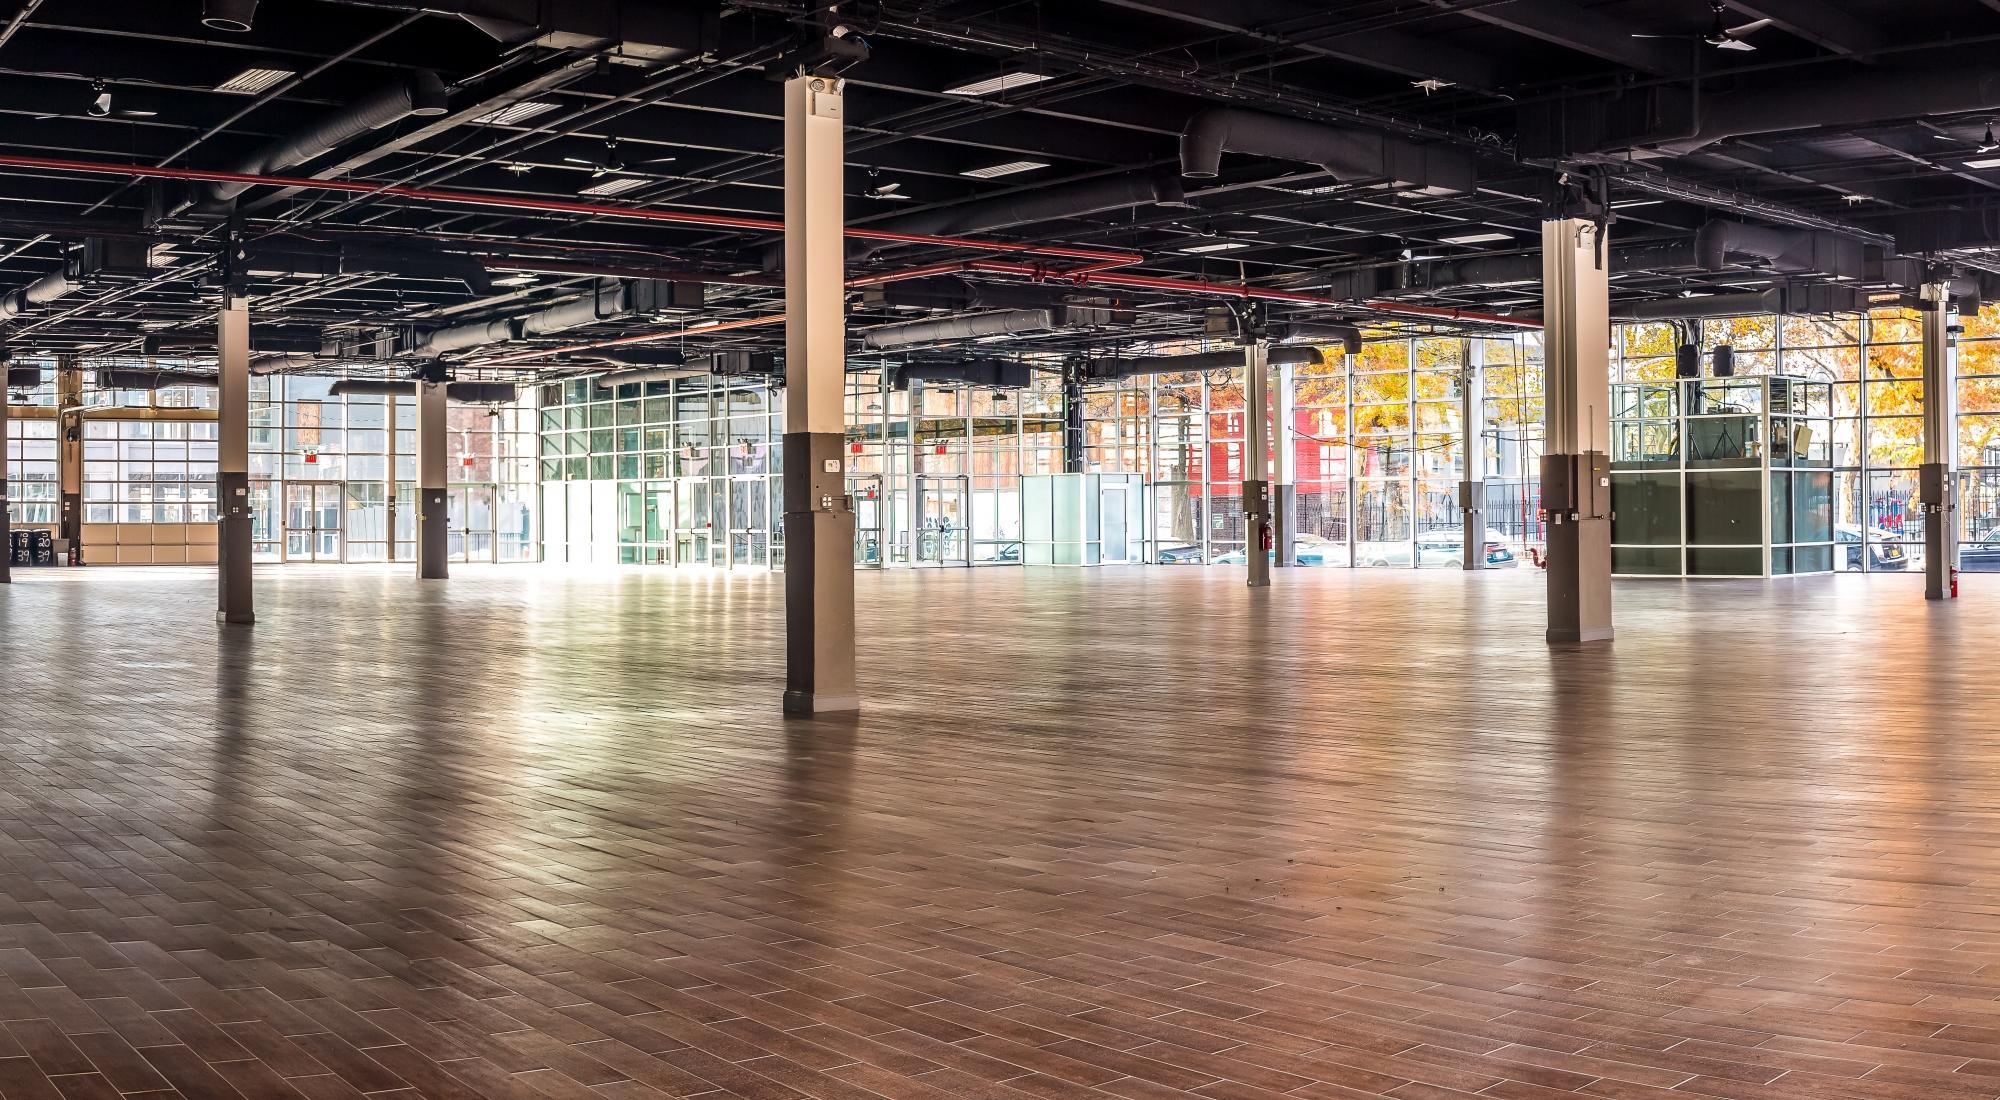 Brooklyn Expo Center